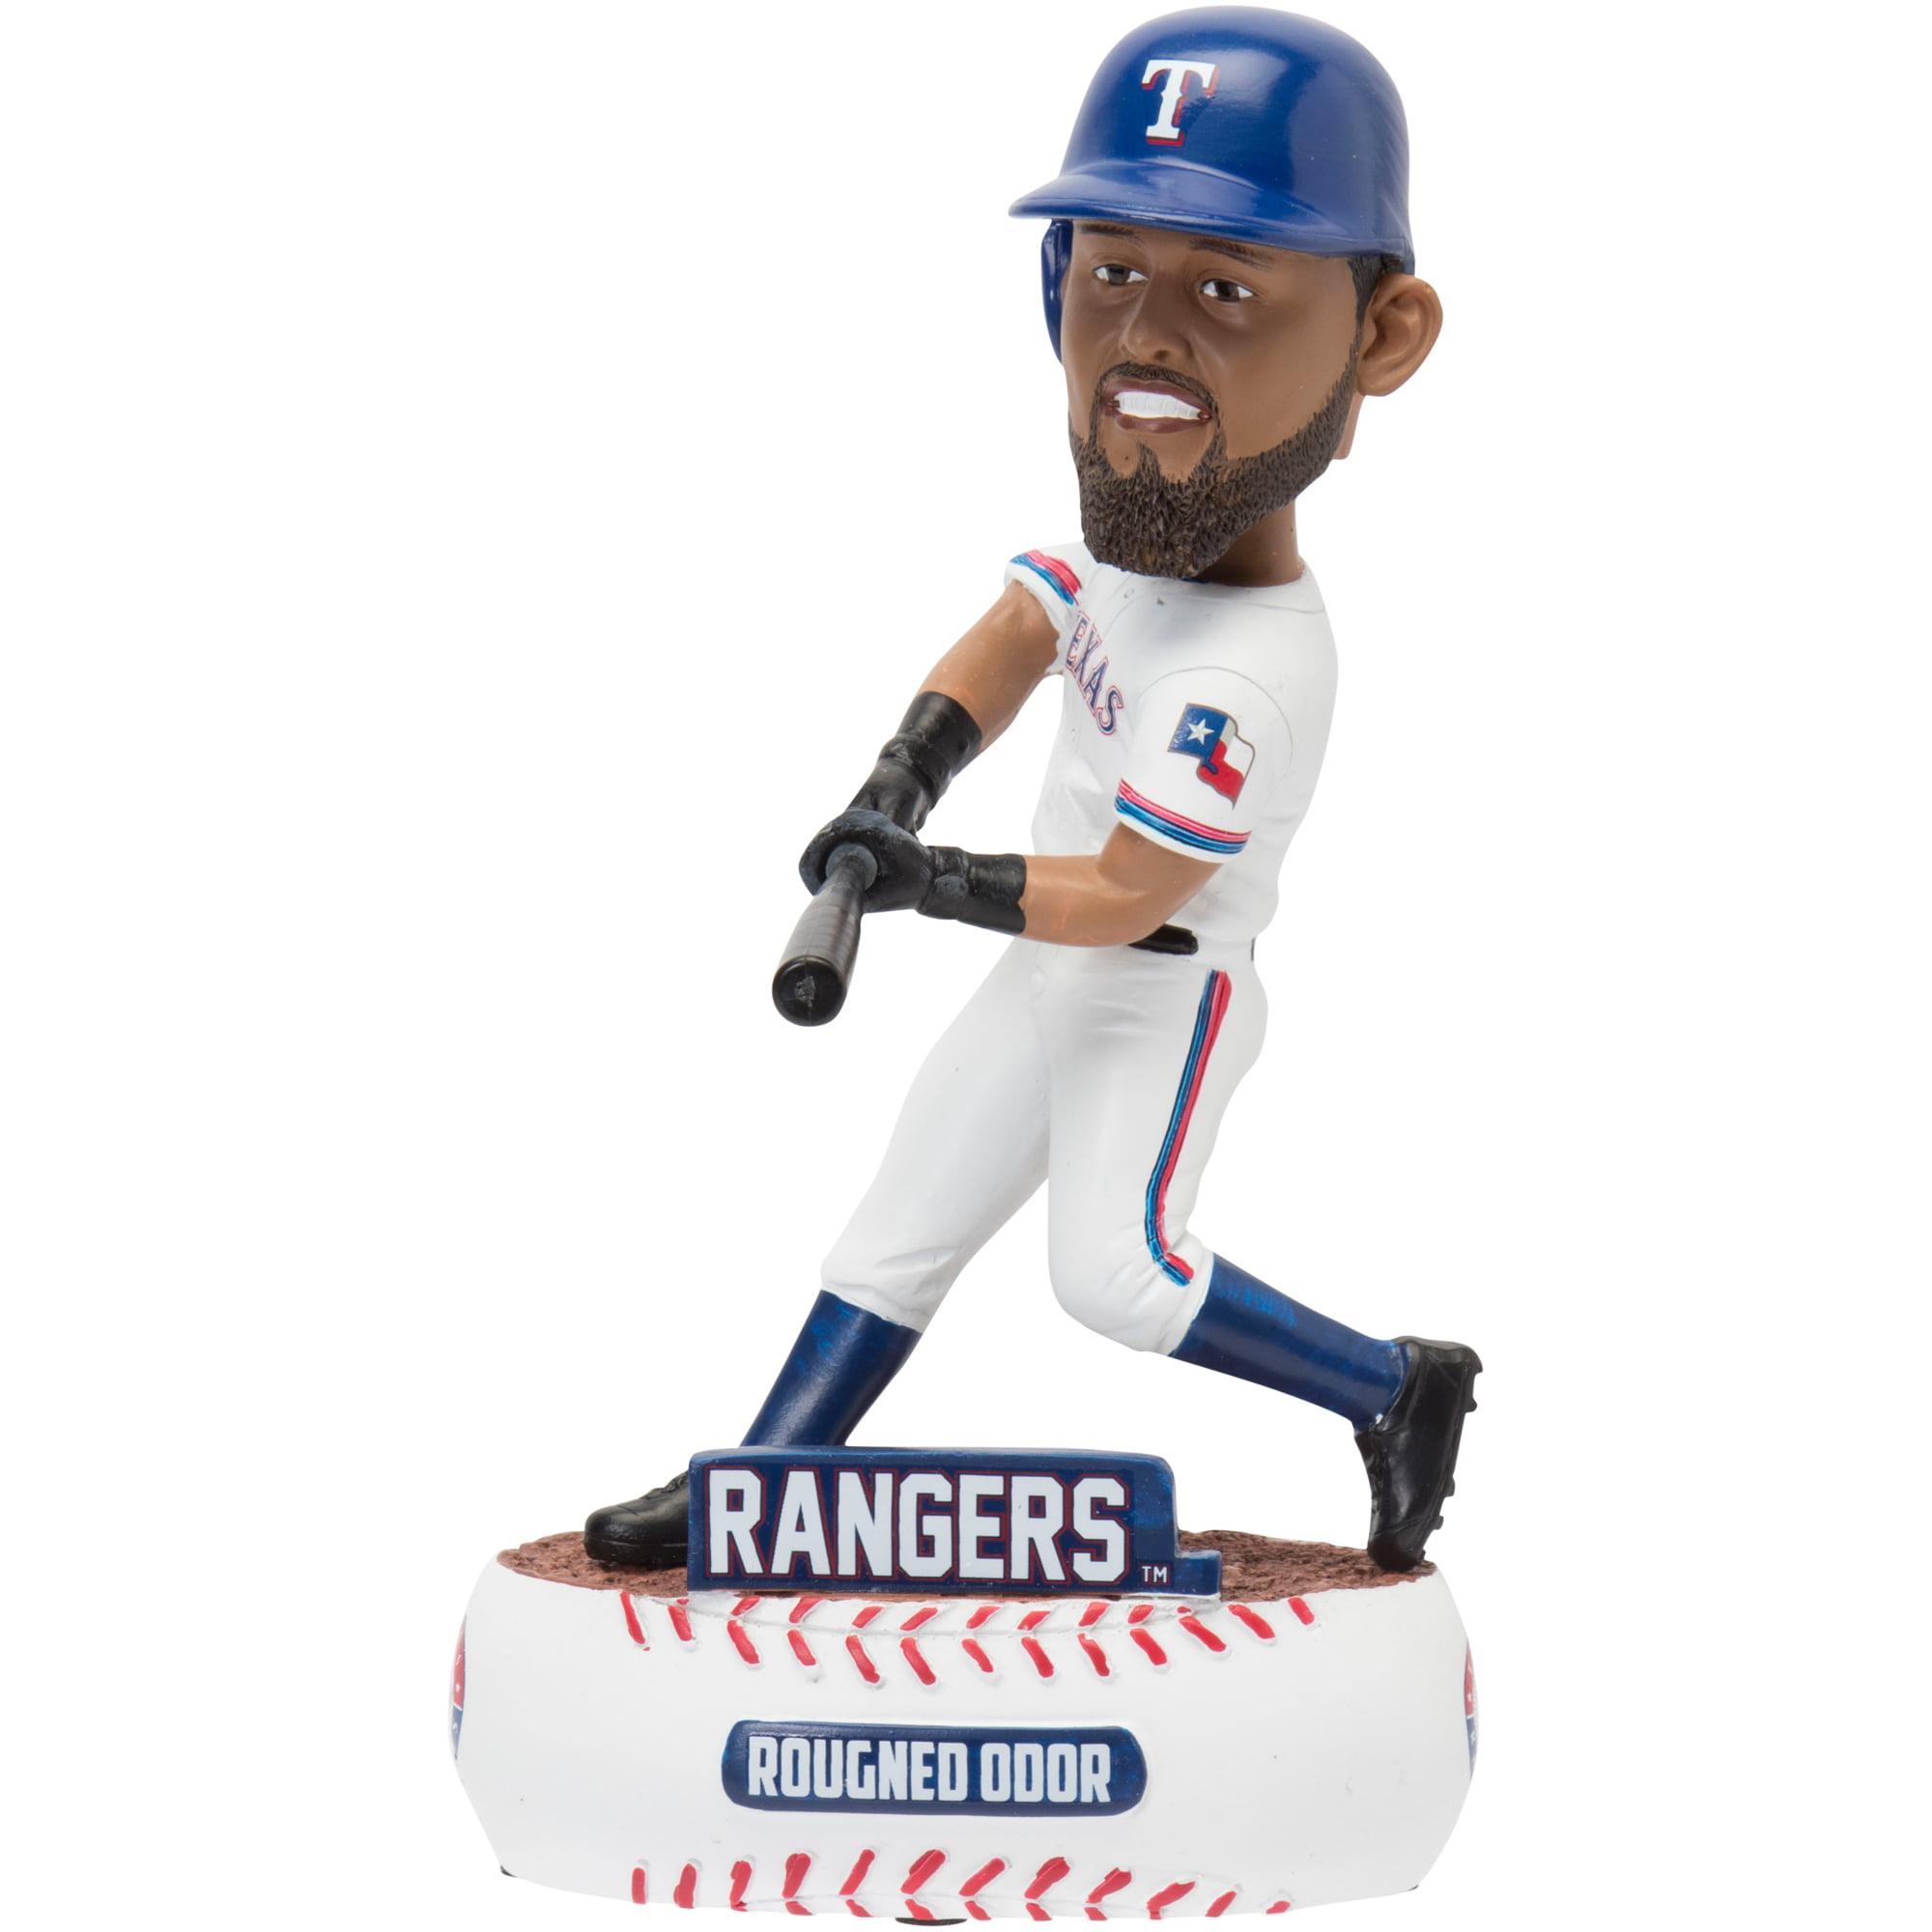 Rougned Odor Texas Rangers Player Baller Bobblehead - No Size